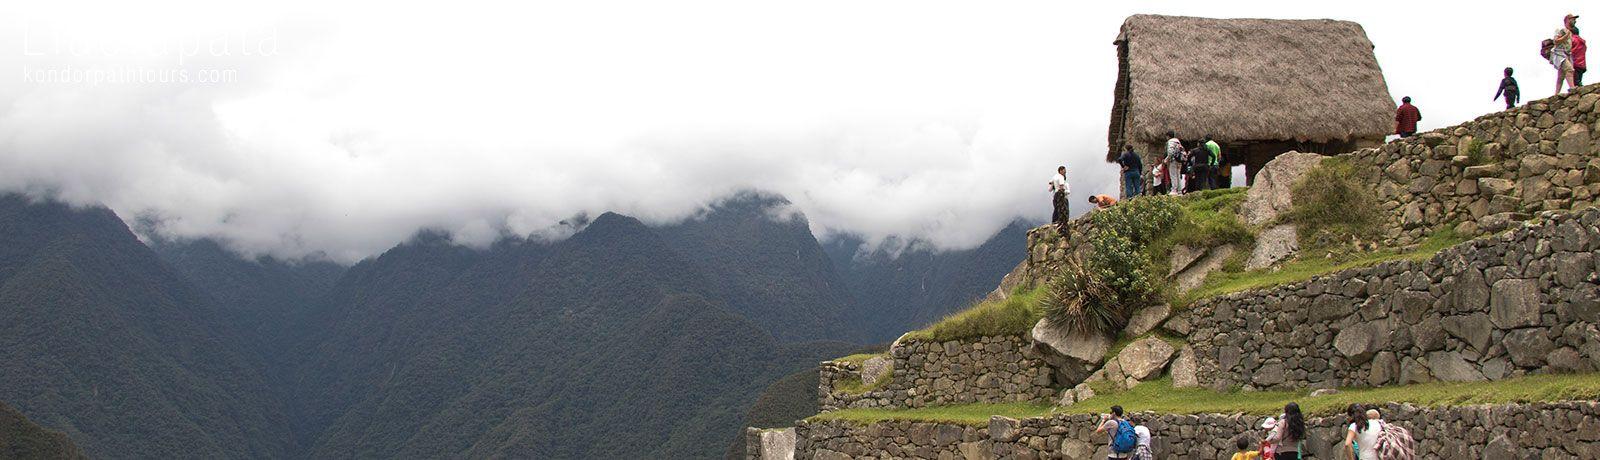 Salkantay Trek 5 Days - Machu Picchu Tour